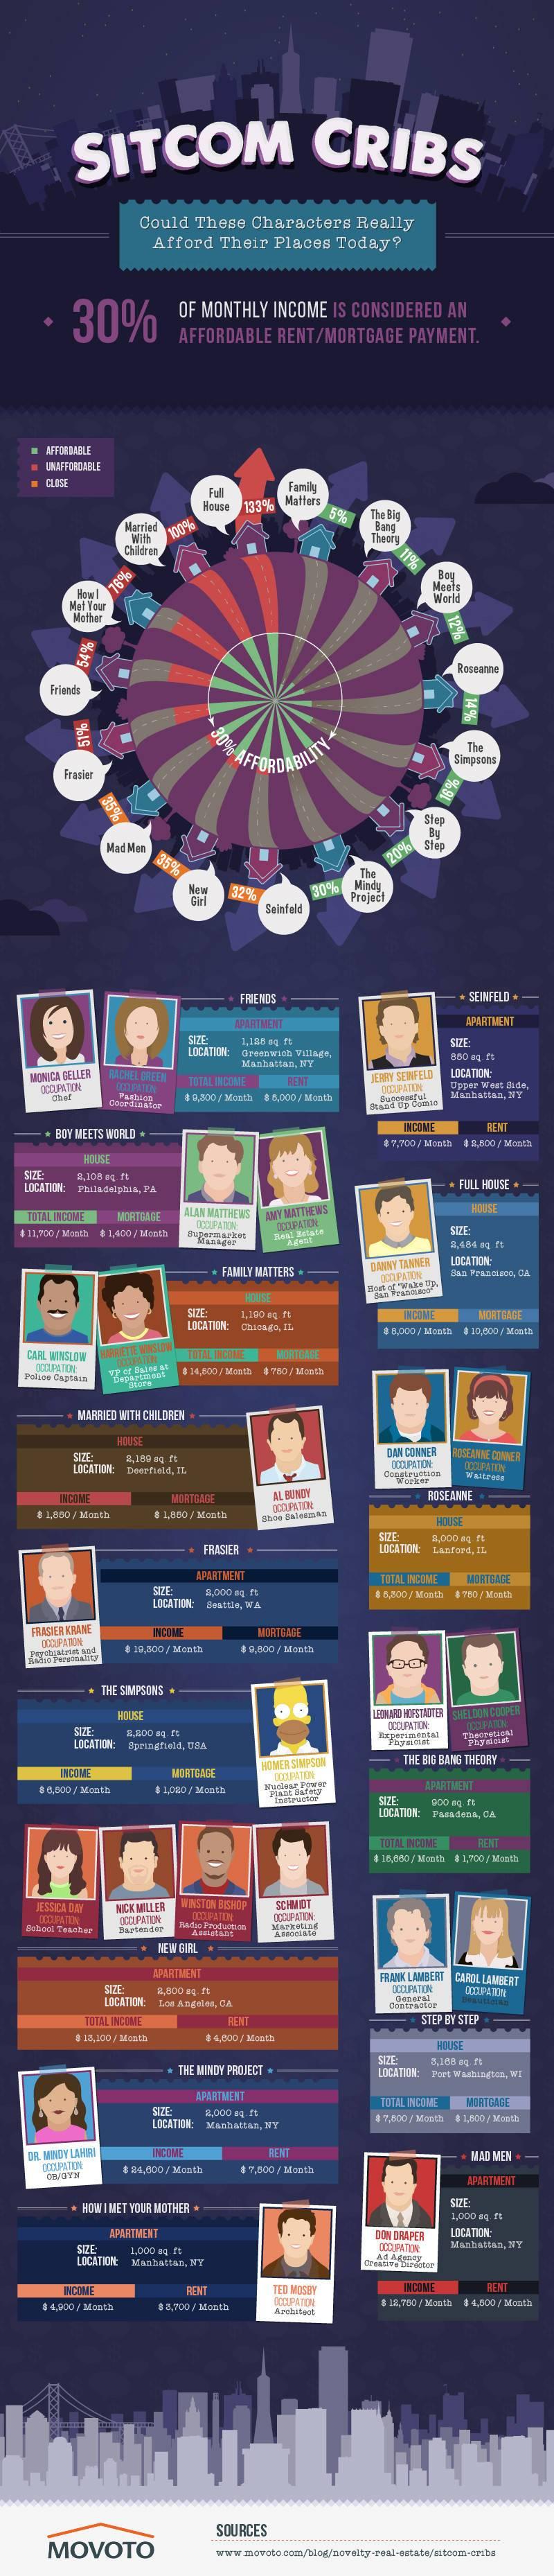 sitcoms-maisons-loyers